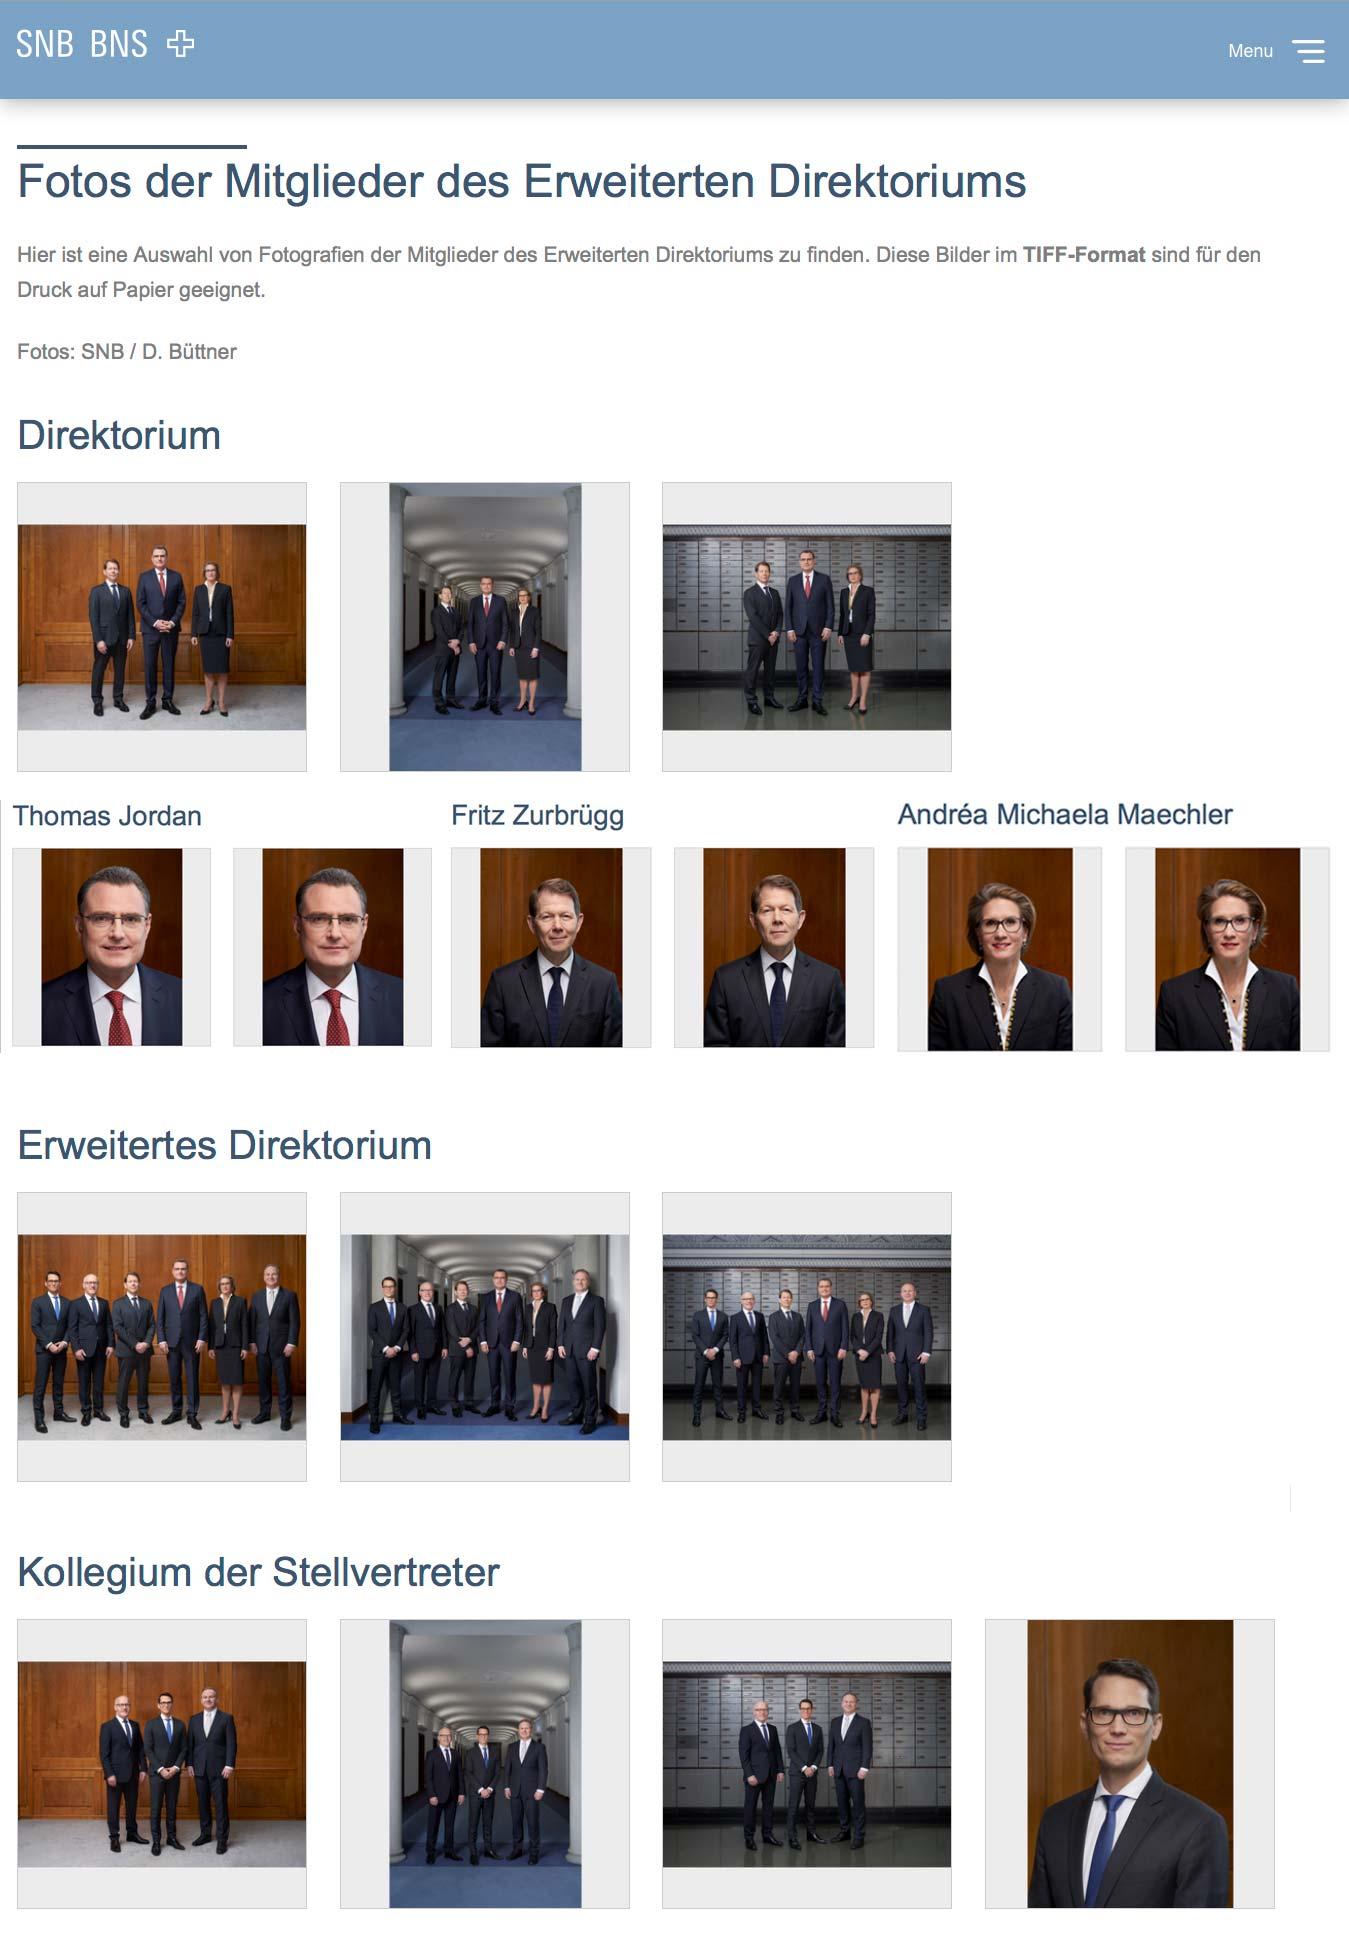 Fotos Dominic Büttner Schweizerische Nationalbank